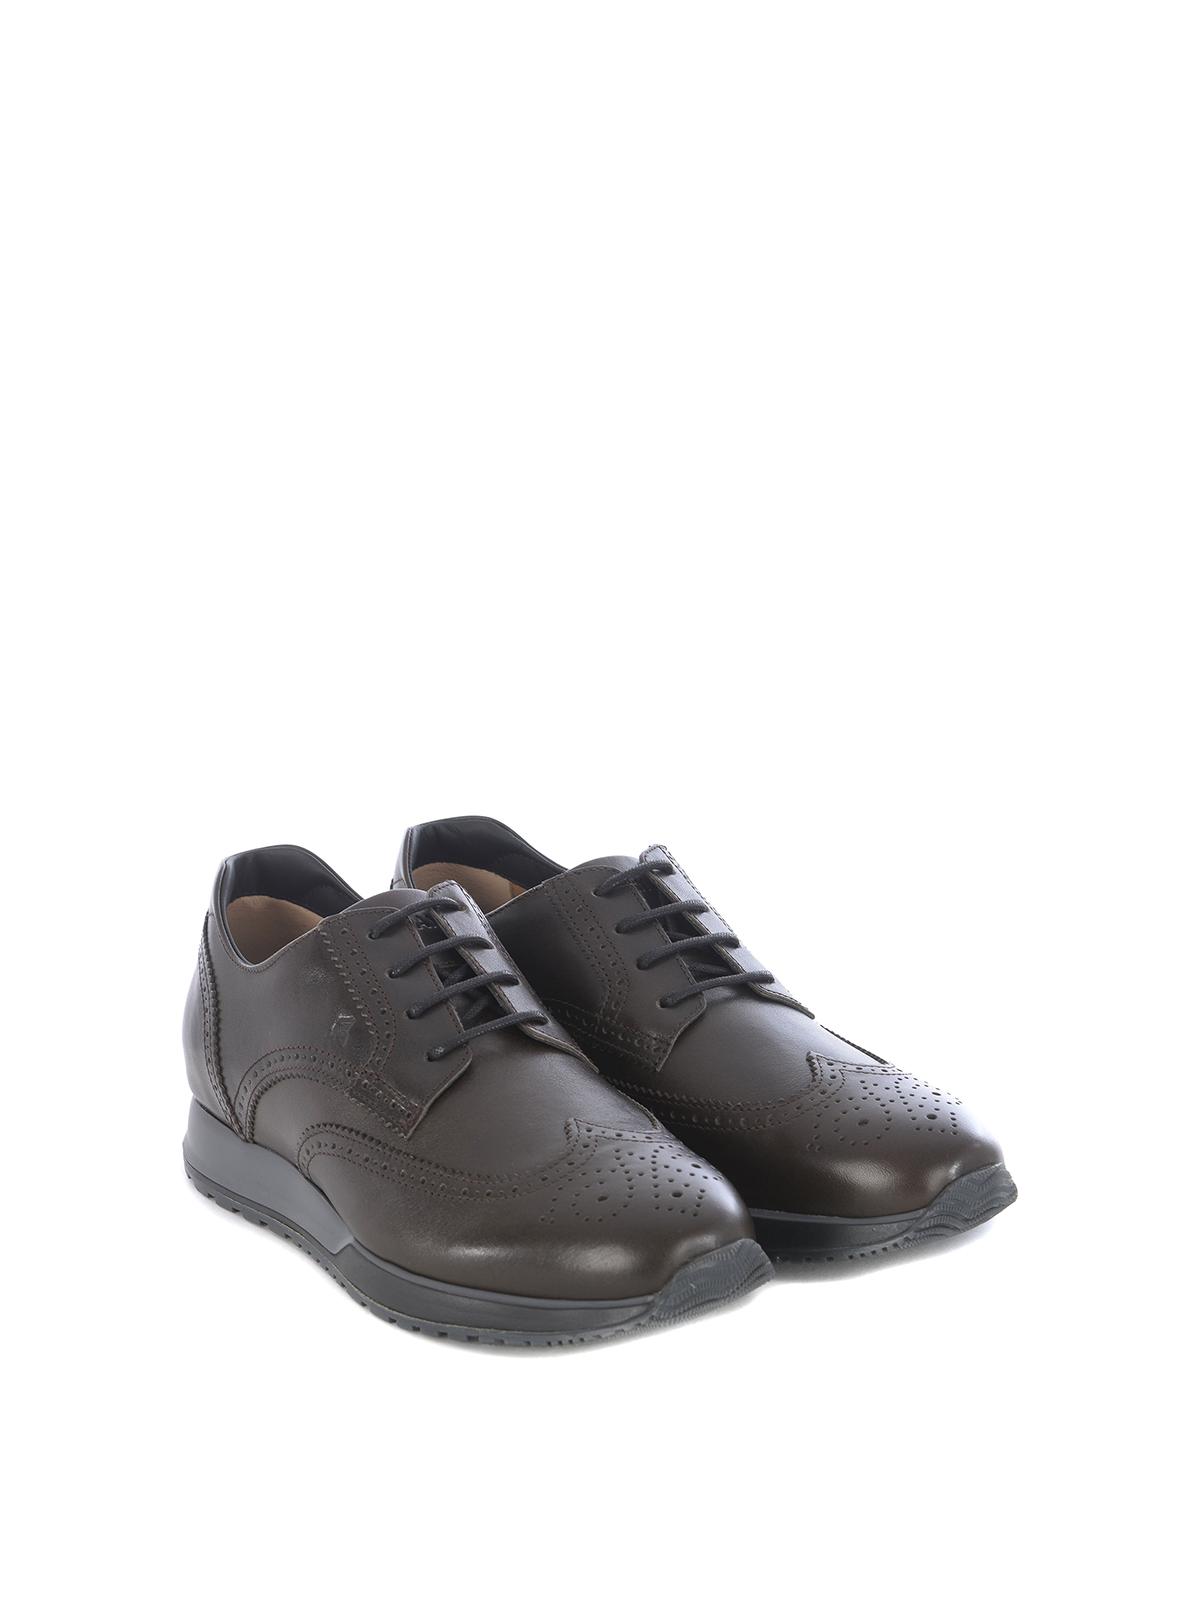 Trainers Hogan - H321 Derby brogue sneakers - HXM3210BX50LDVS807